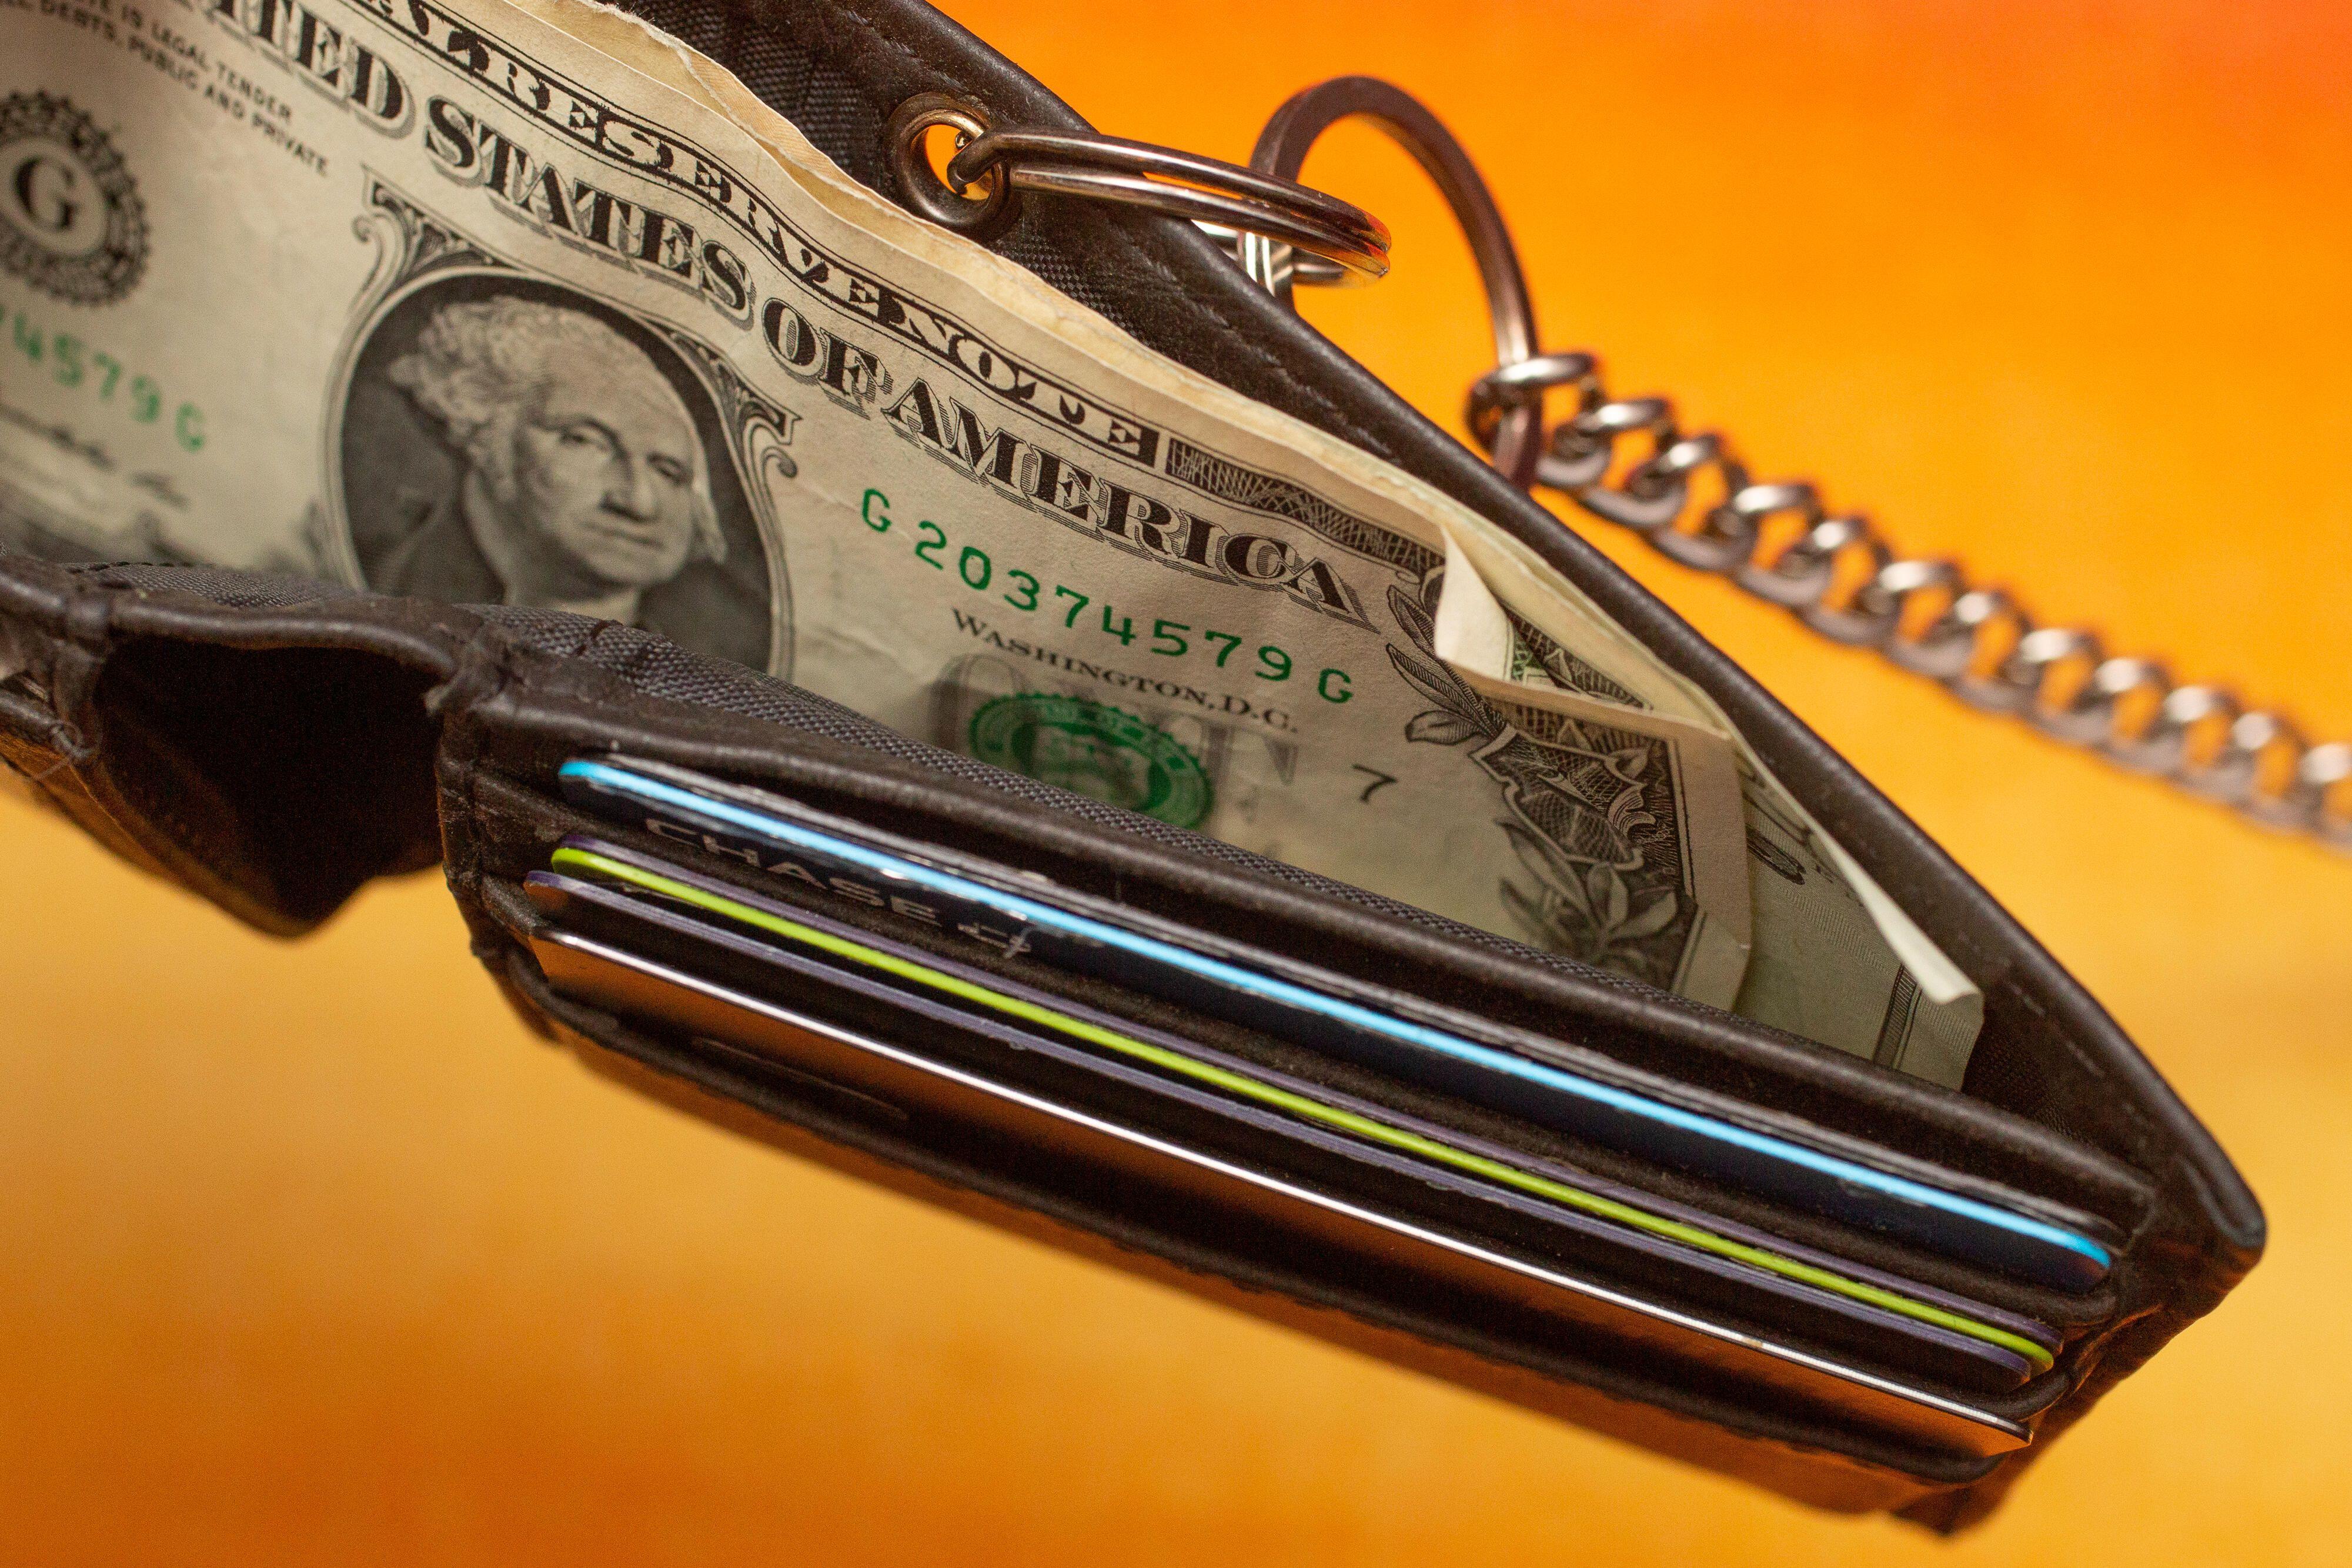 004-cash-stimulus-empty-wallet-economic-crisis-dollar-bill-currency-2020